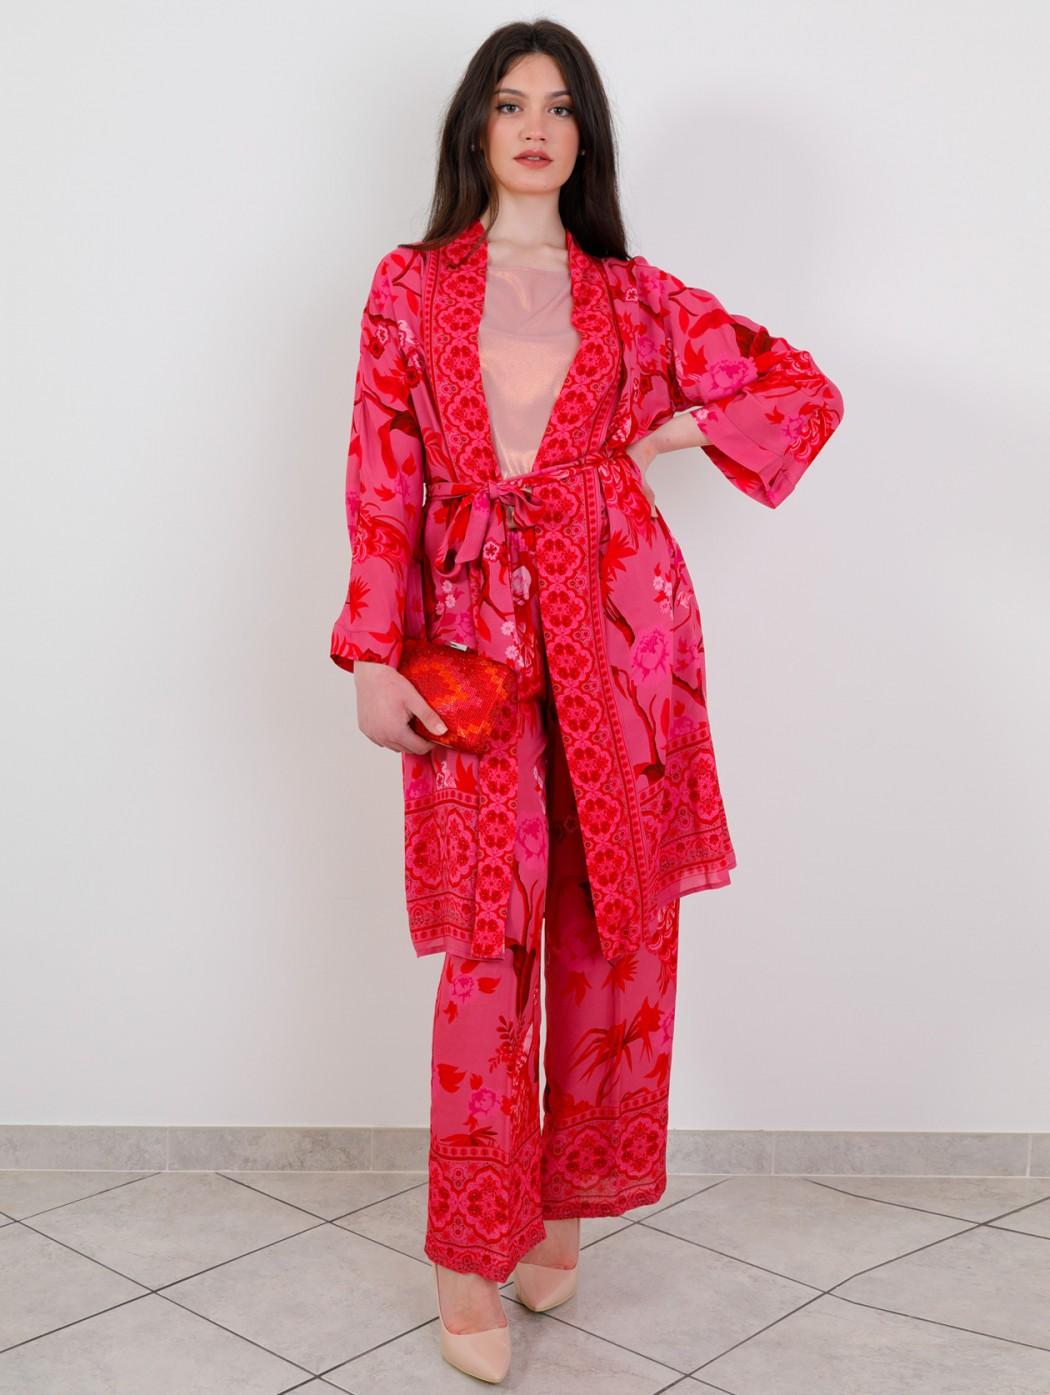 Red and fuchsia silk kimono...